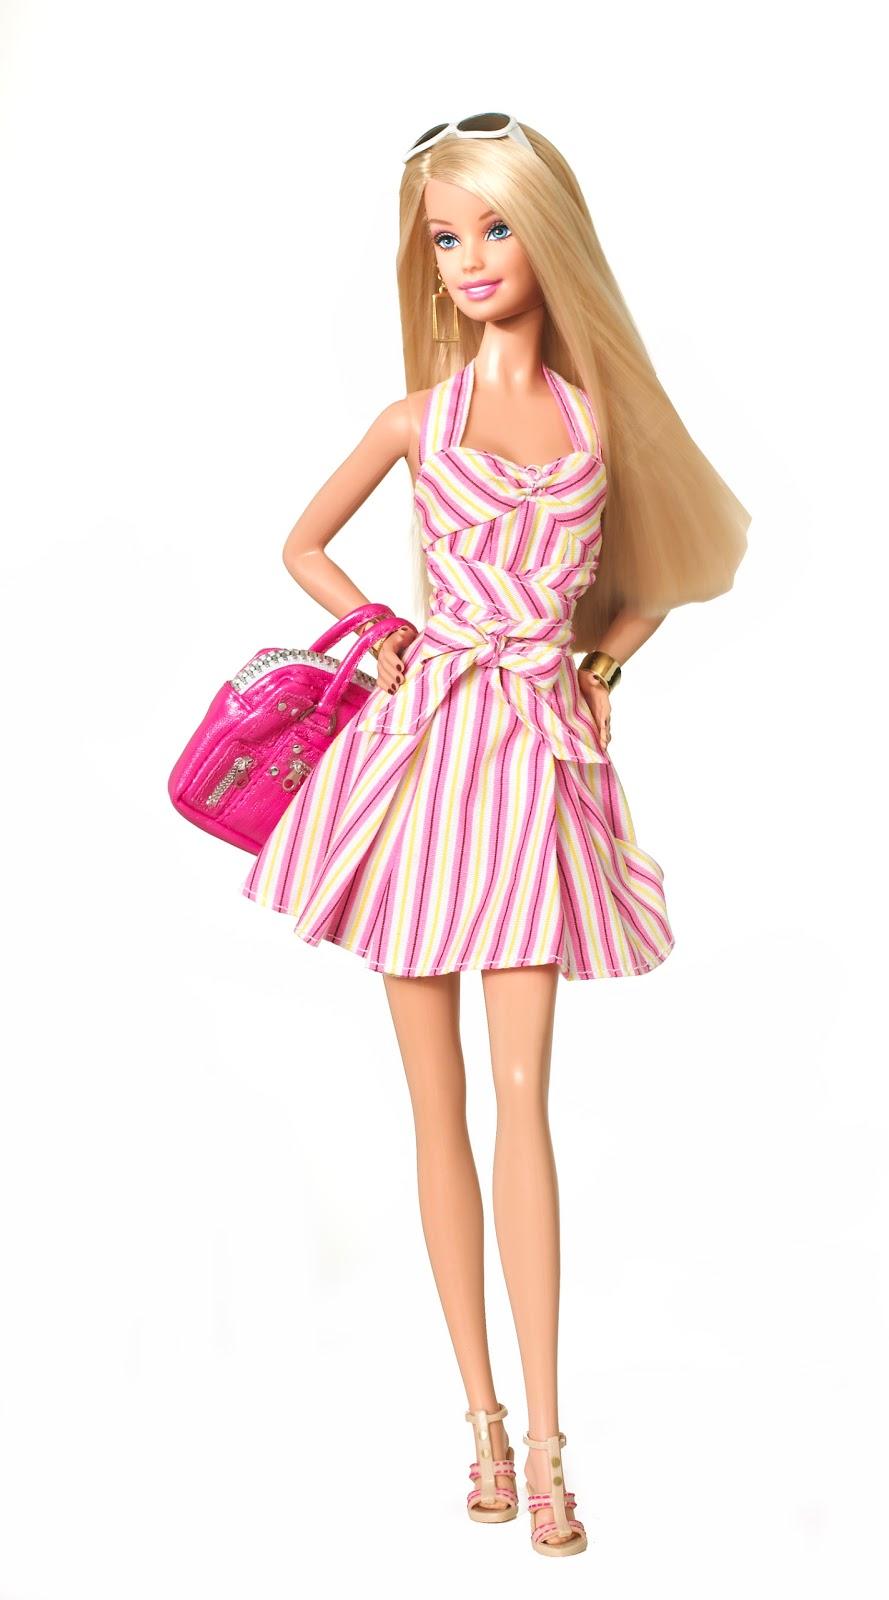 Life 39 s an adventure barbies for Bambole barbie